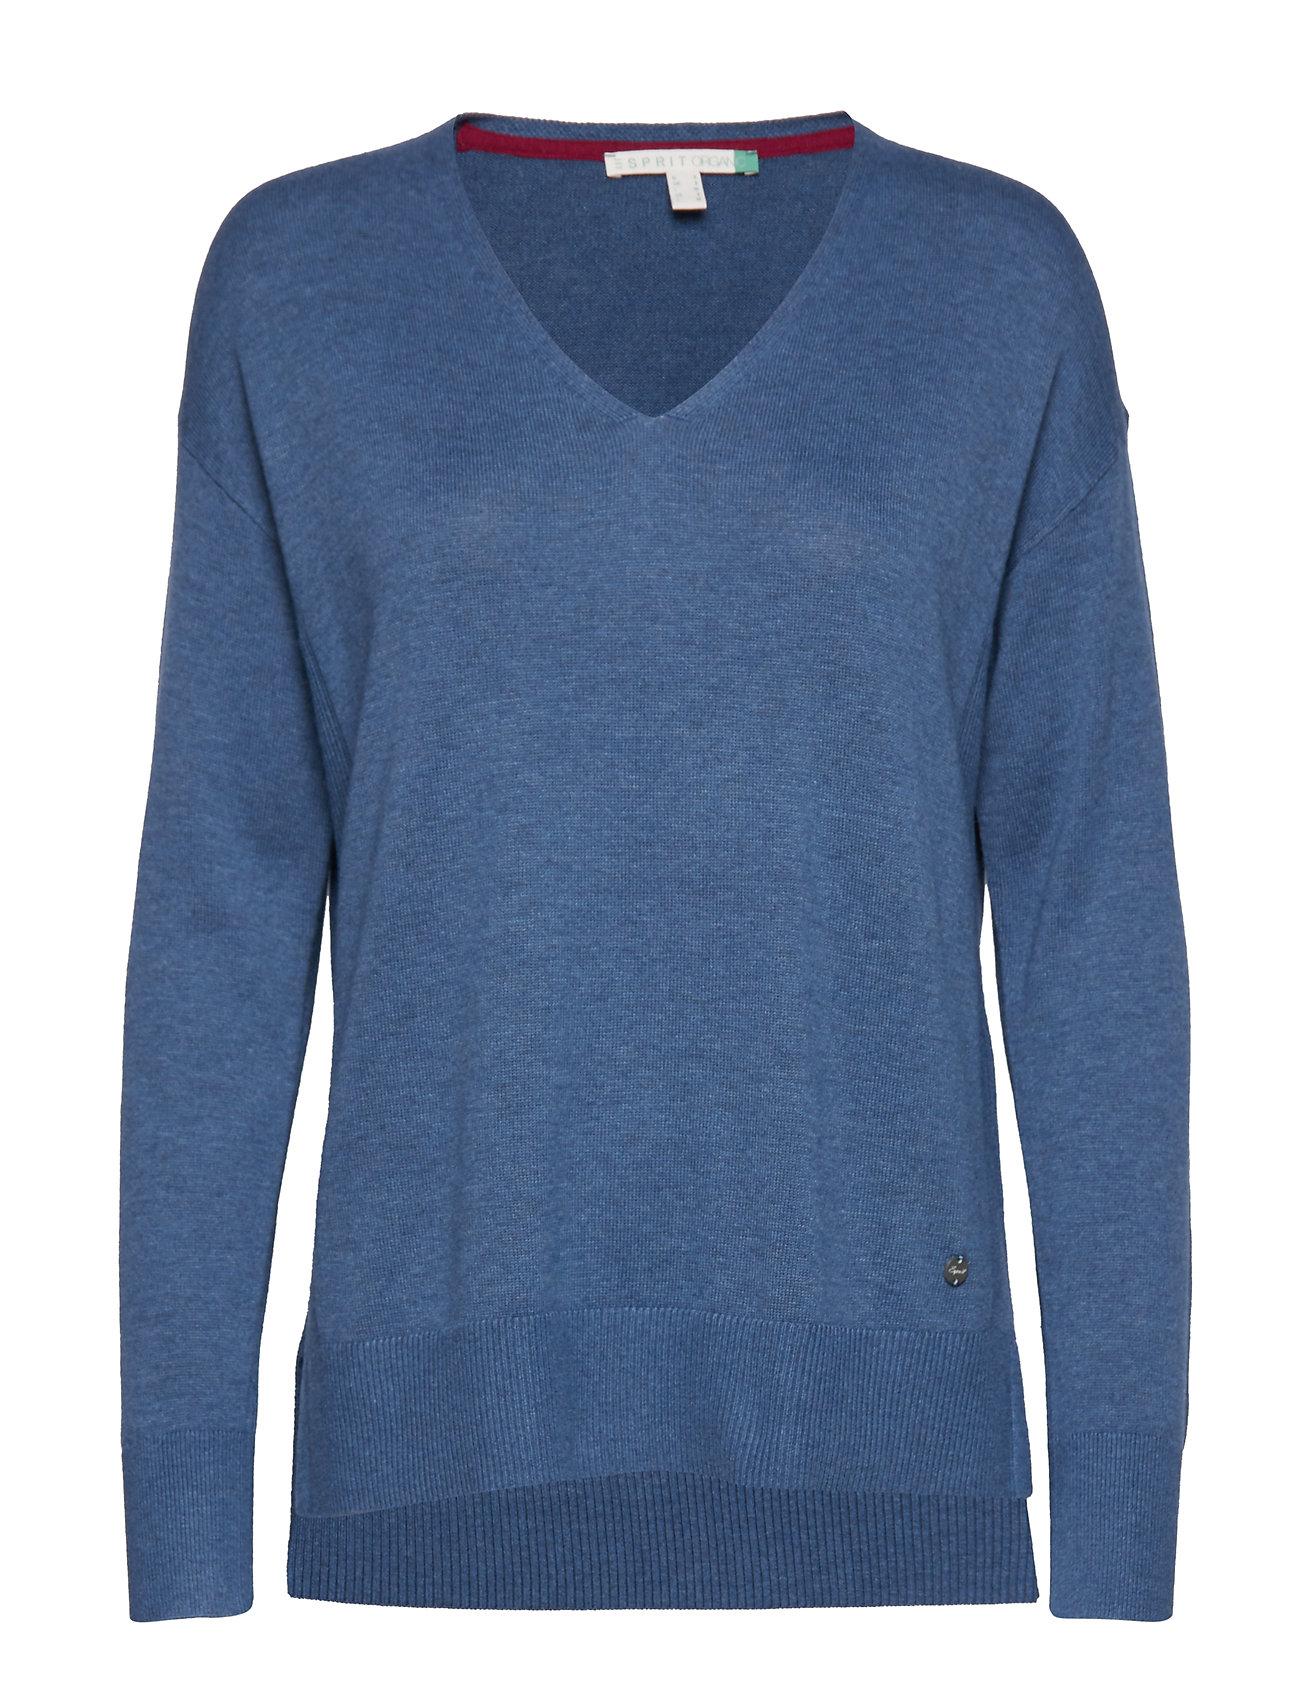 Esprit Casual Sweaters - GREY BLUE 5